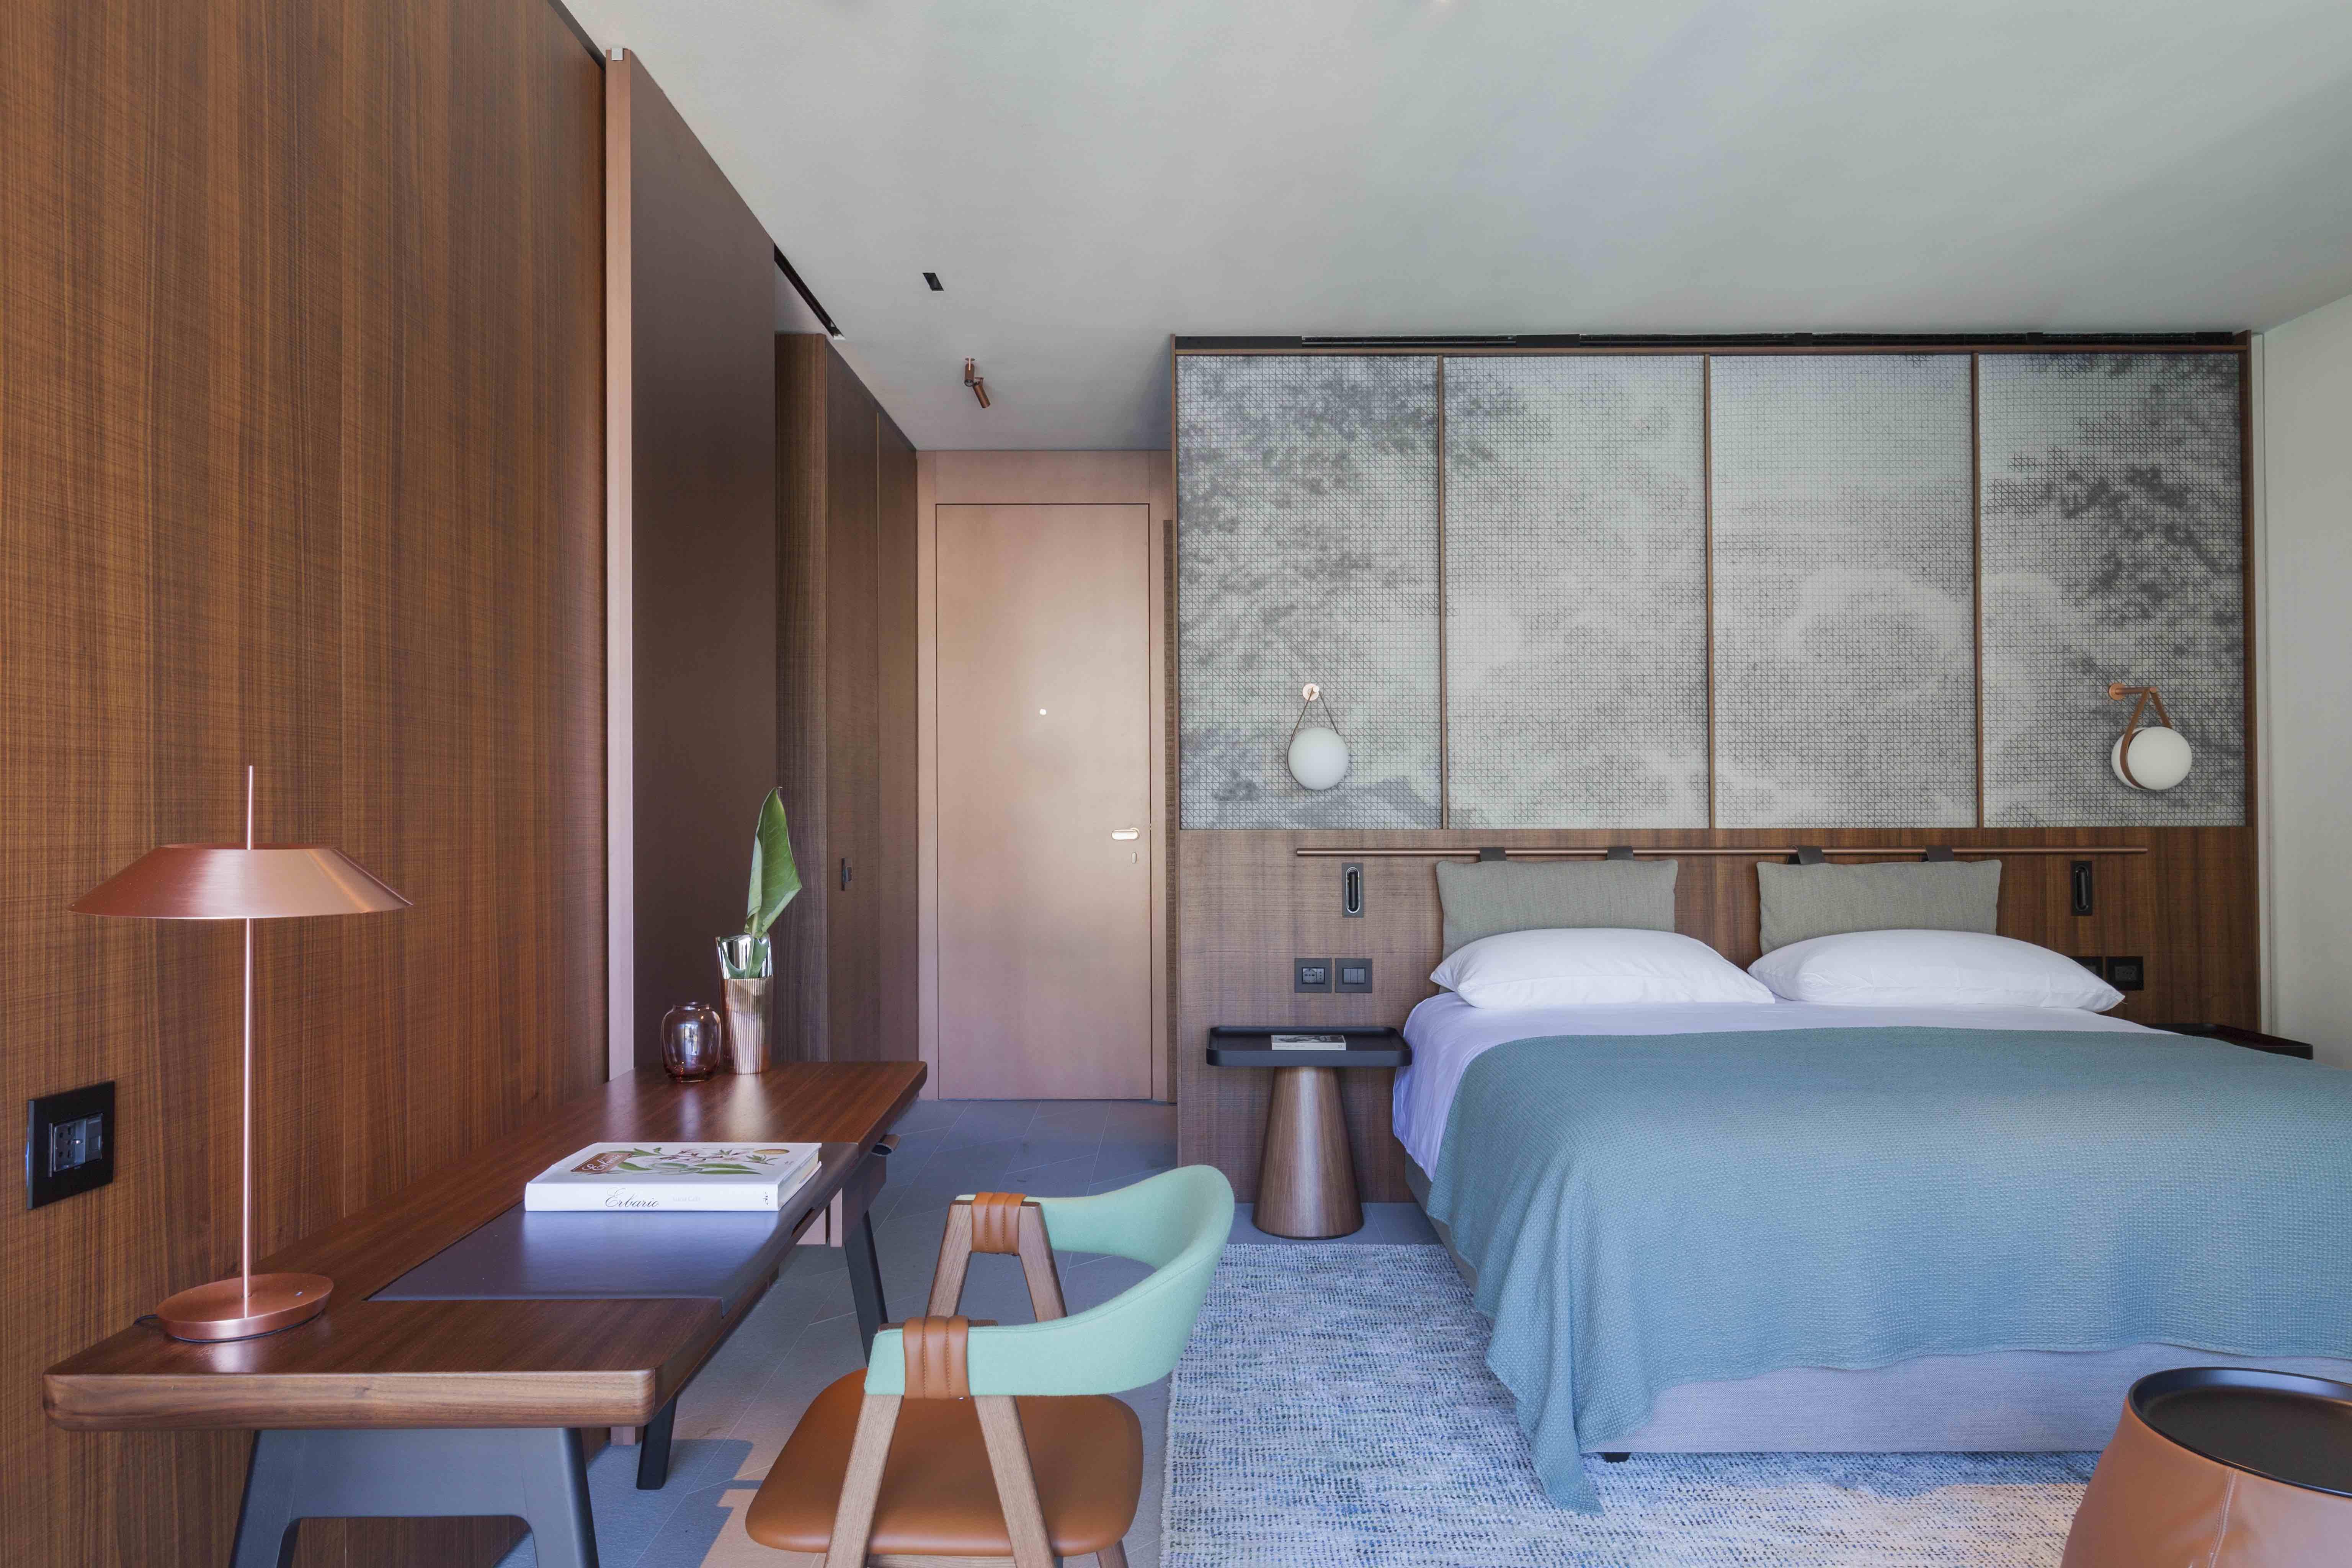 https://d11s8ysge2pxse.cloudfront.net/app/uploads/2017/09/Kamer-van-Hotel-Il-Sereno-Lago-di-Como-ontworpen-door-Patricia-Urquiola.jpg